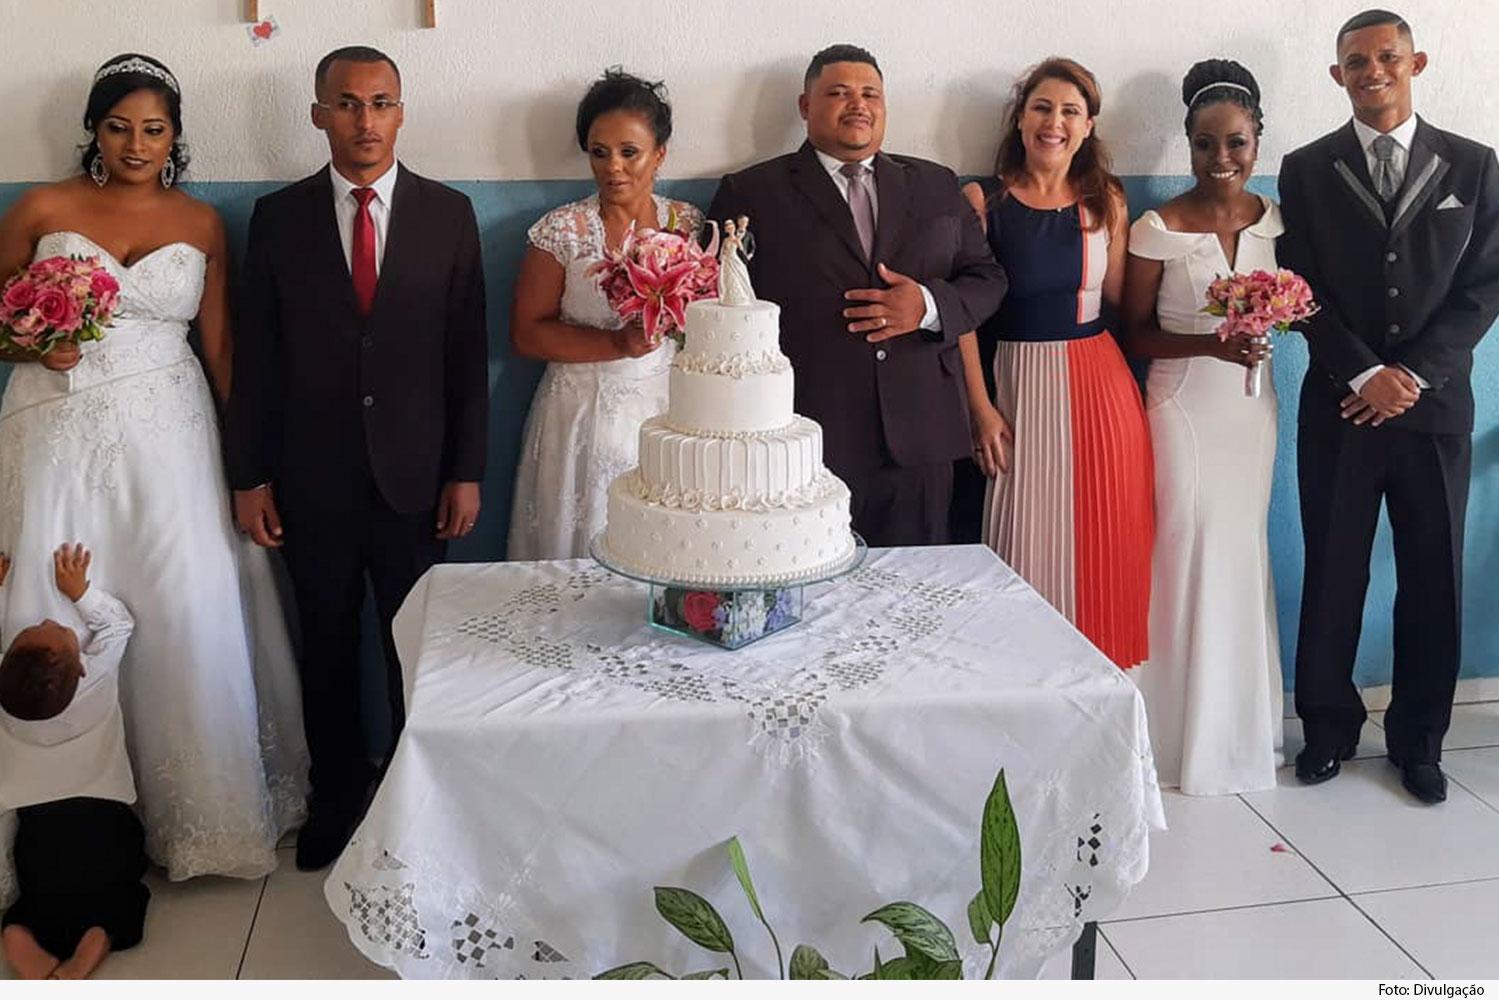 noticia2-casamento-comunitario-campo-belo-18.09.19.jpg